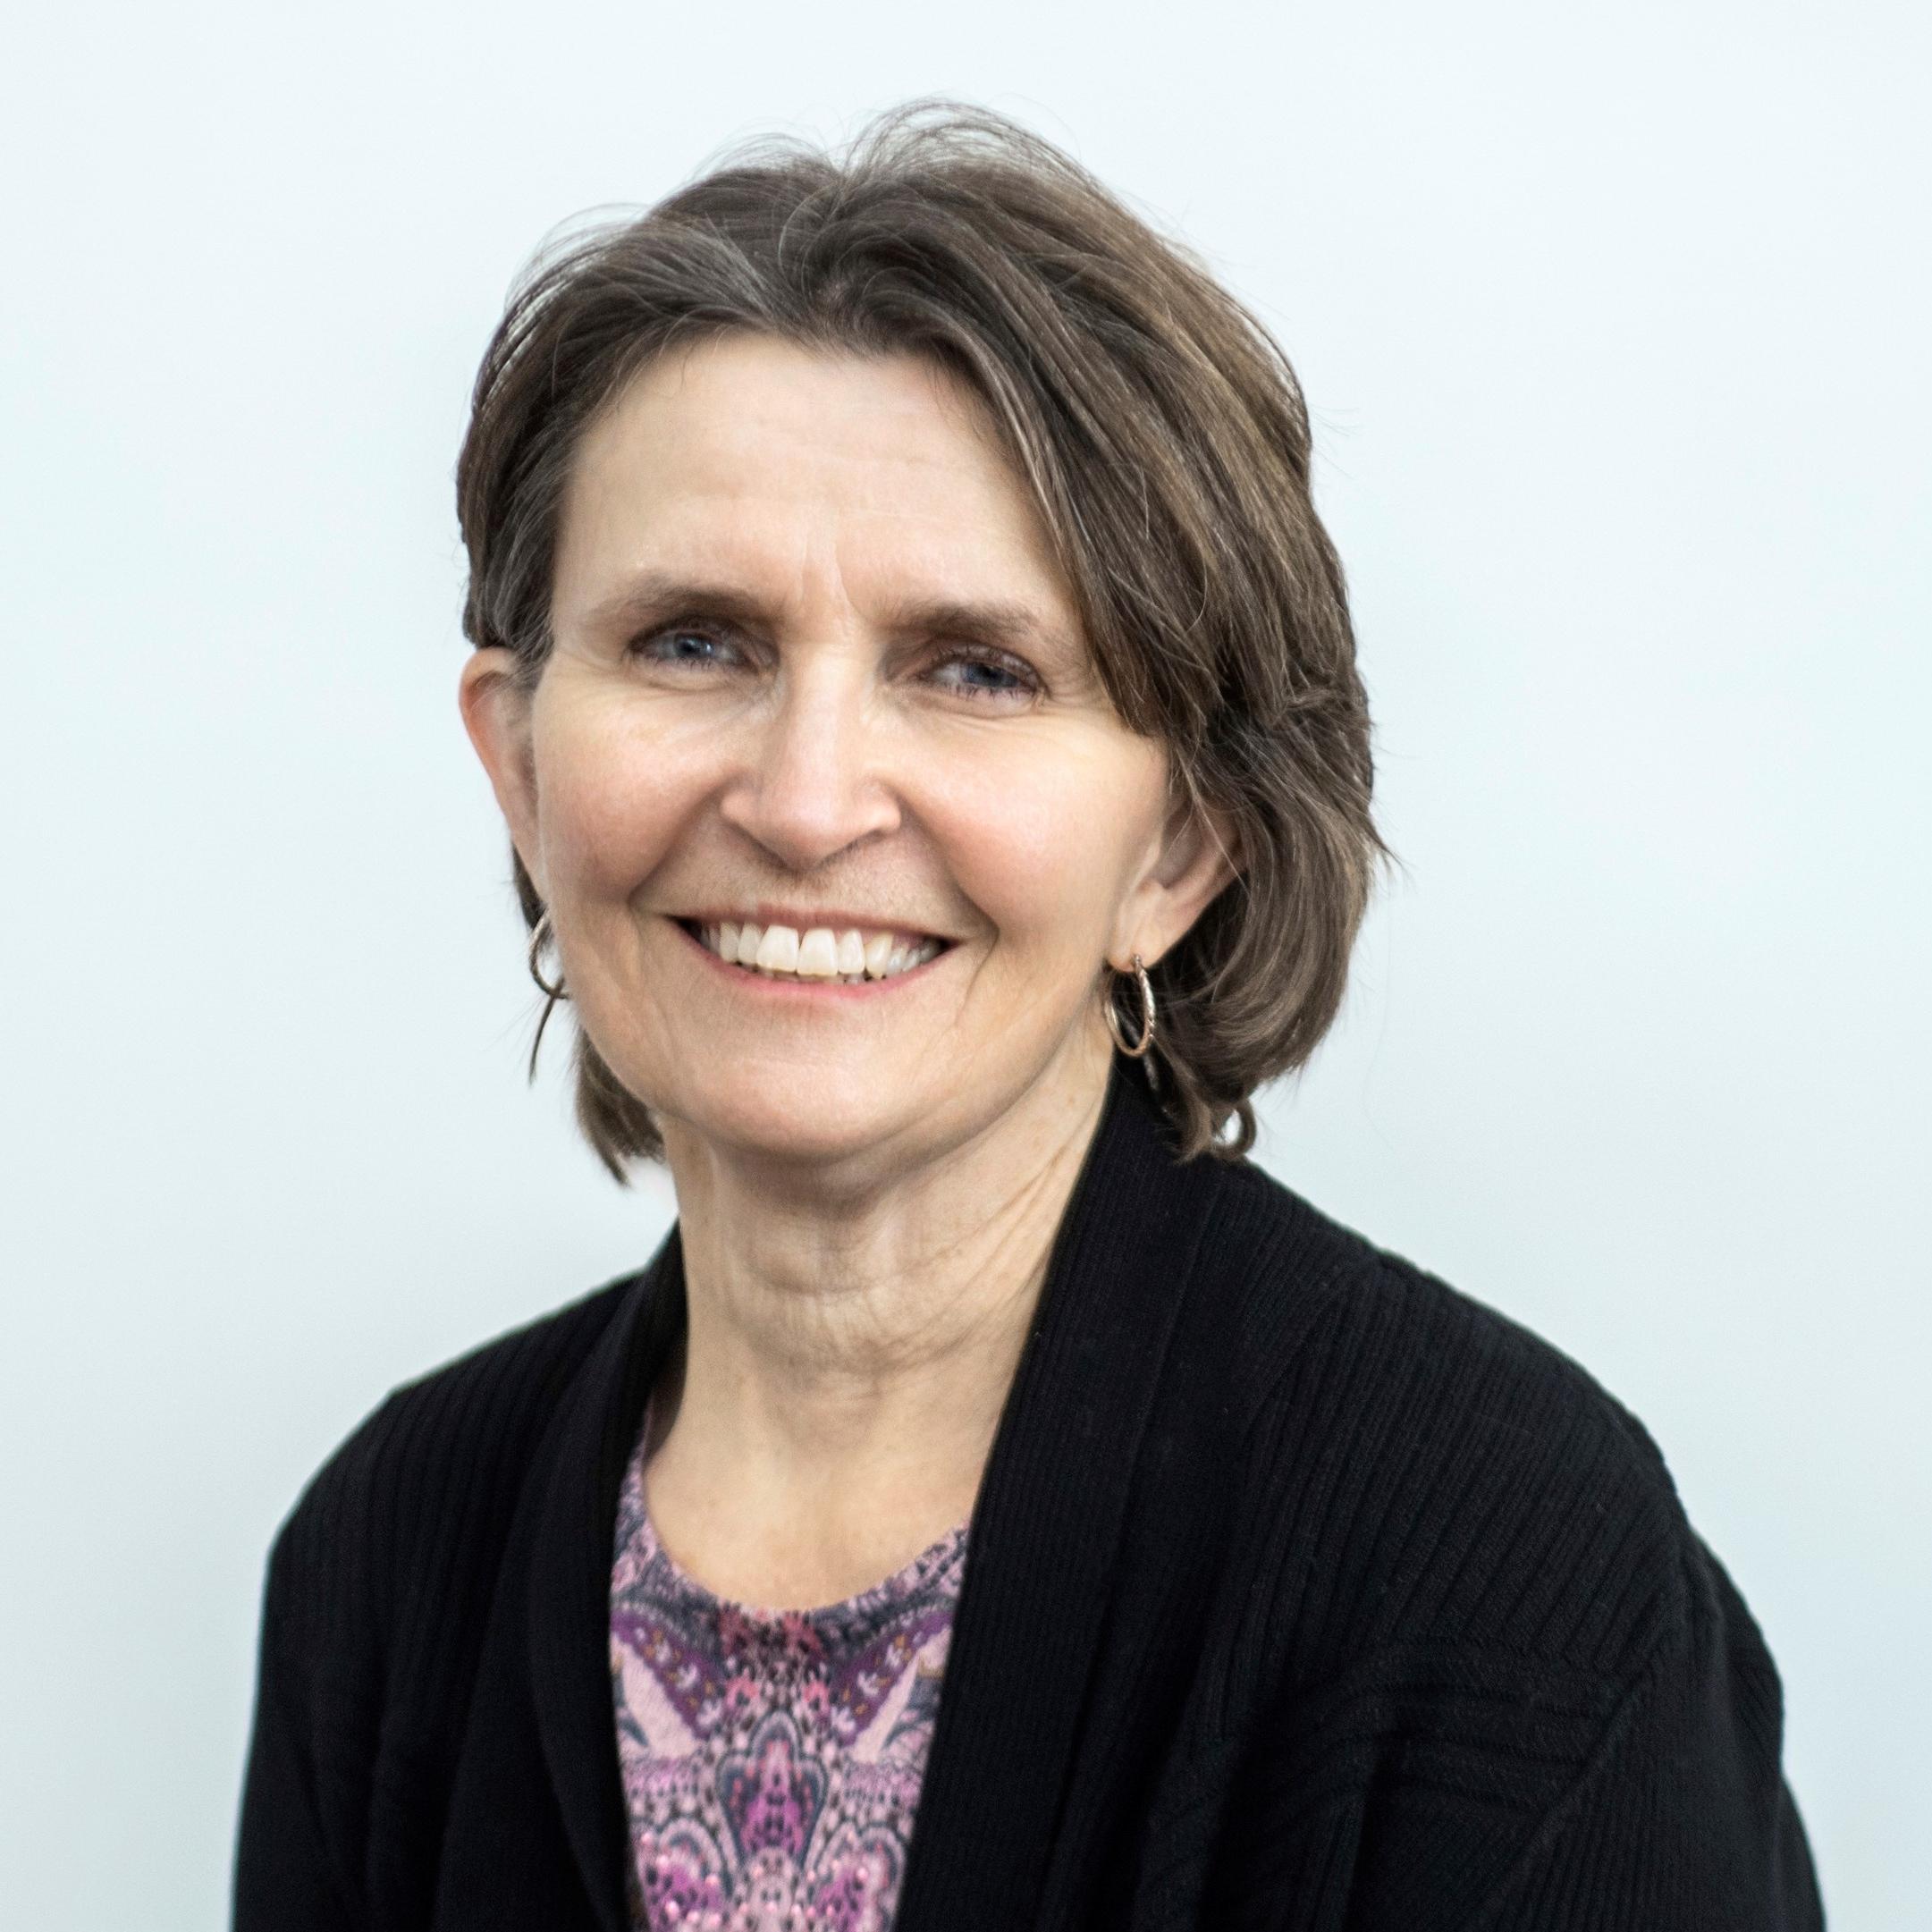 Judie Goldberg